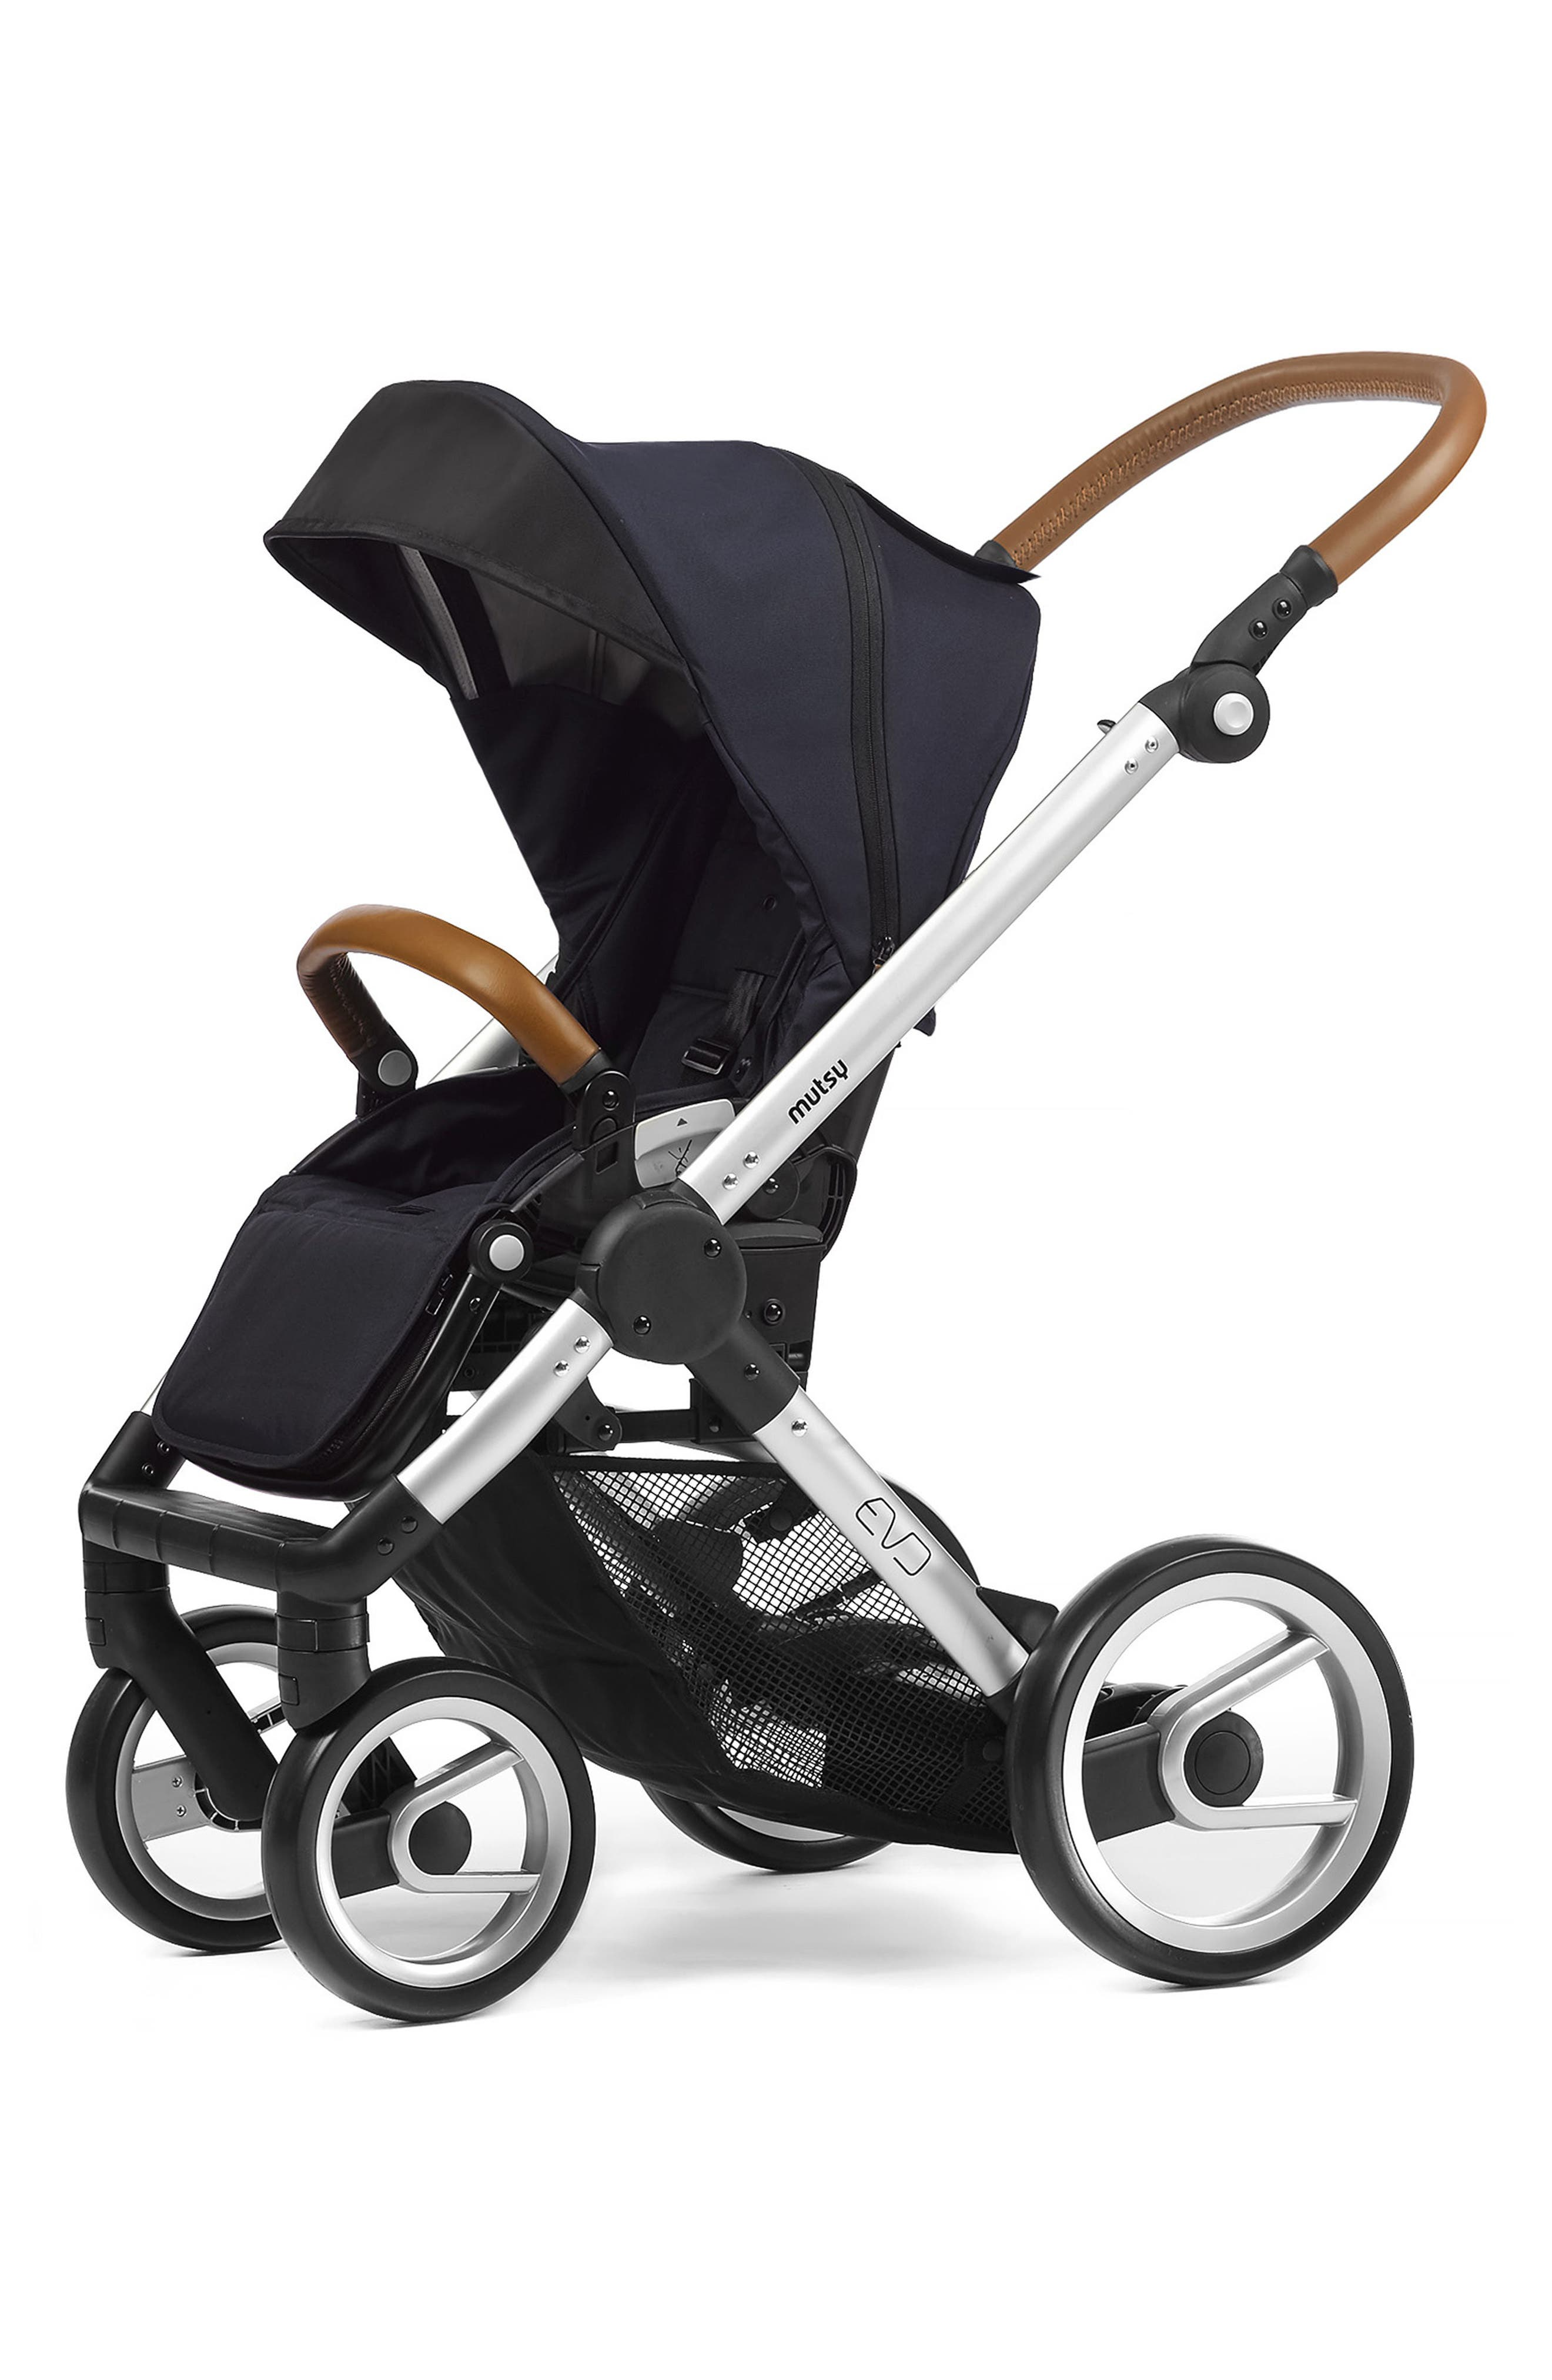 Evo - Urban Nomad Stroller,                         Main,                         color, 040